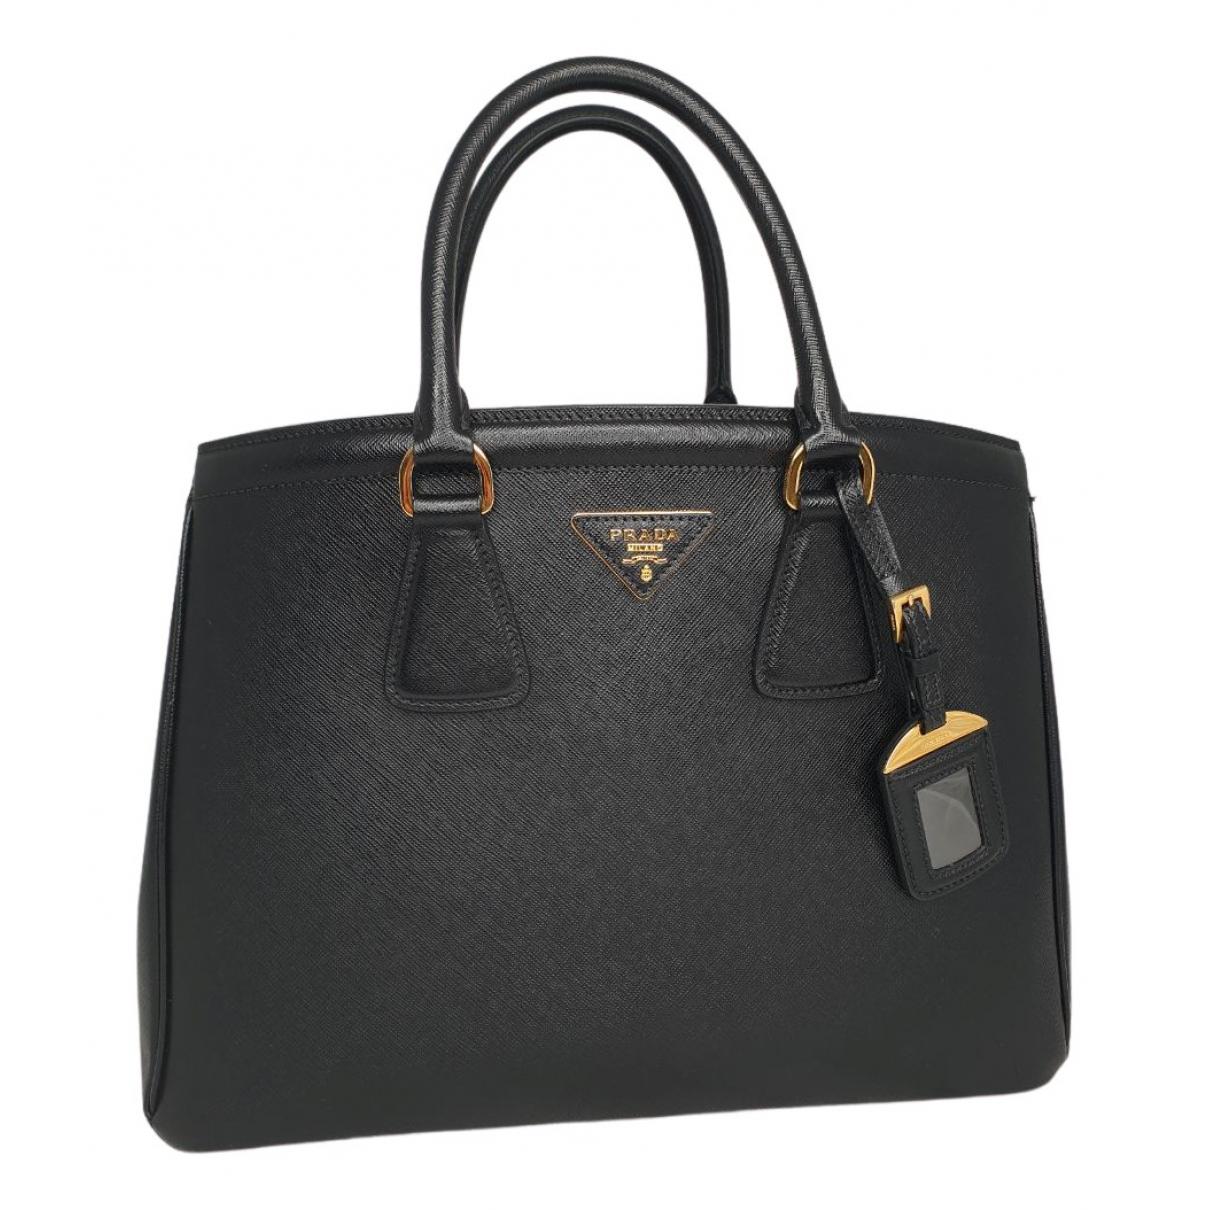 Prada Galleria Black Leather handbag for Women N